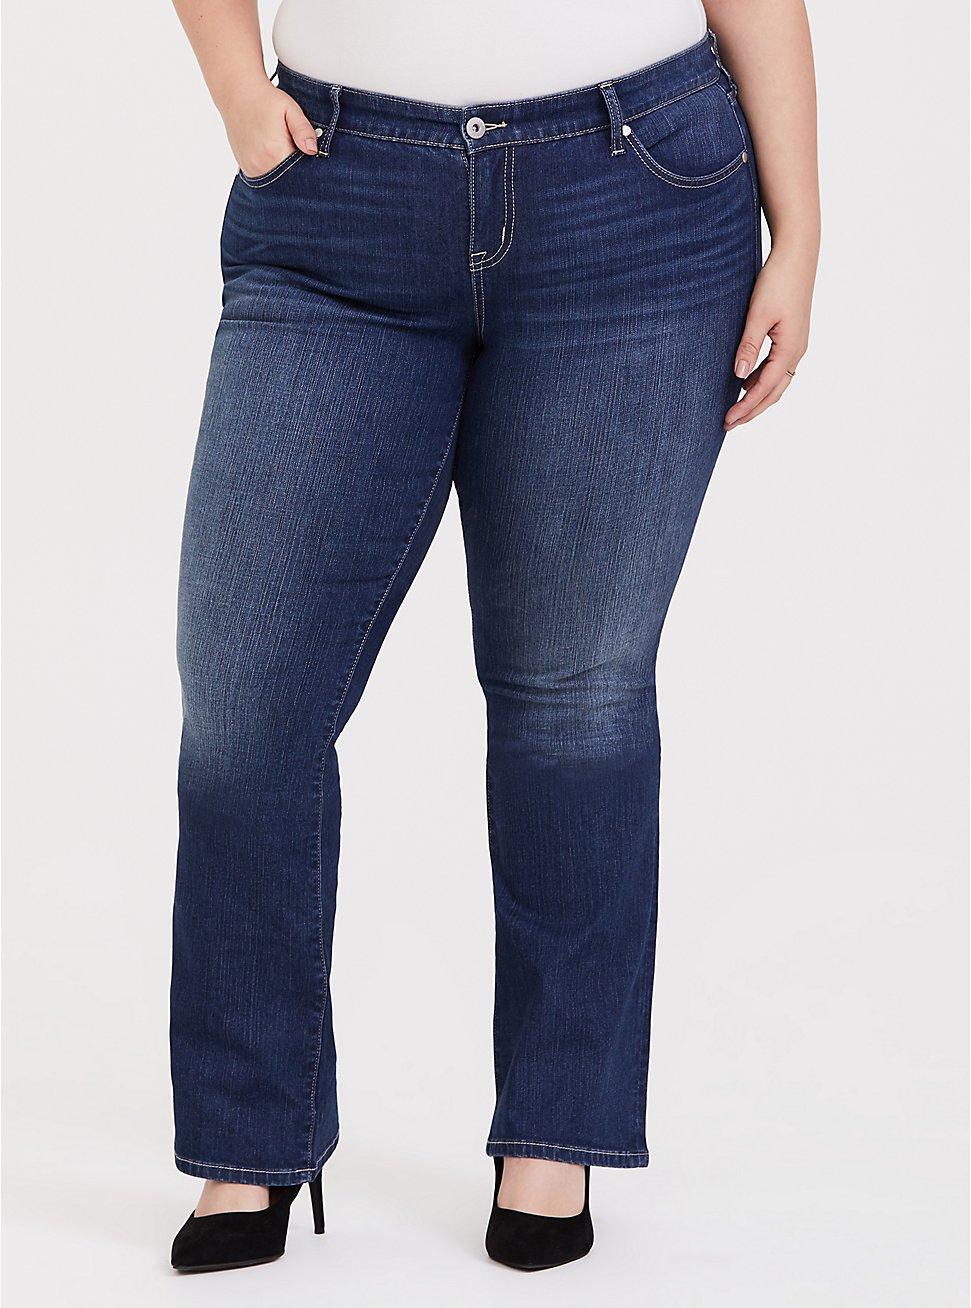 Slim Boot Jean - Vintage Stretch Medium Wash, BACK COUNTRY, hi-res